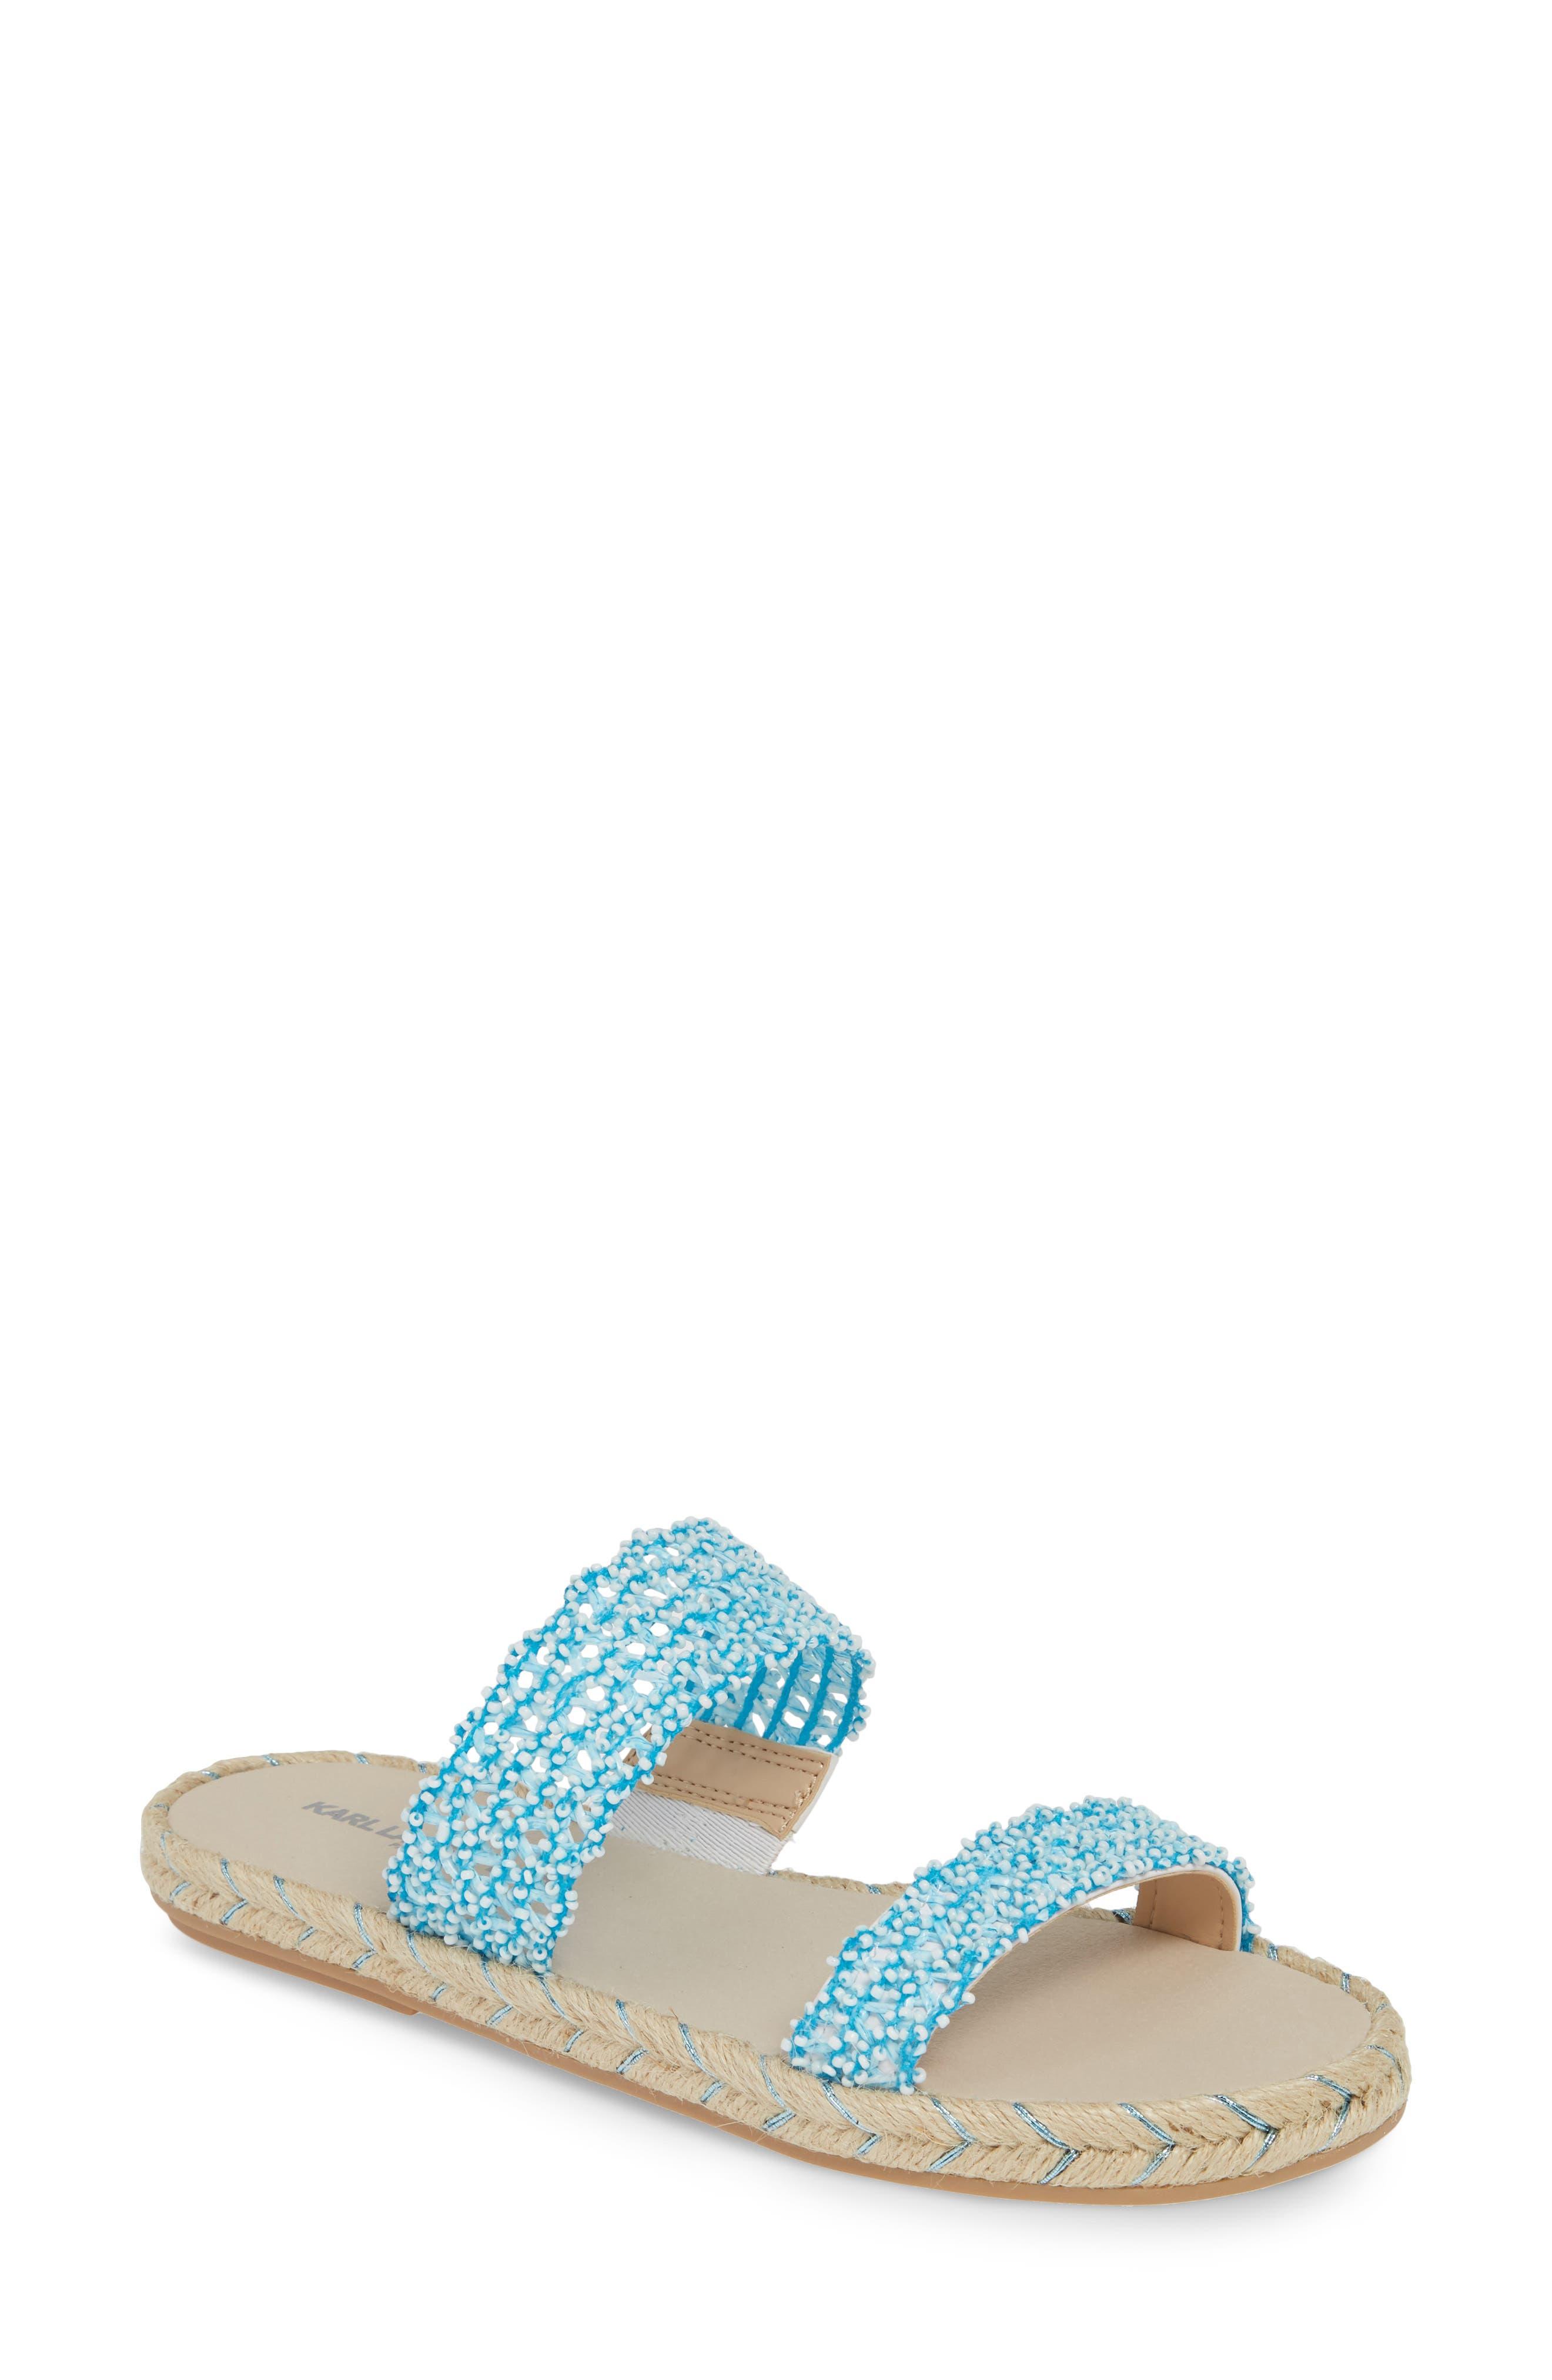 Karl Lagerfeld Paris Nita Slide Sandal- Blue